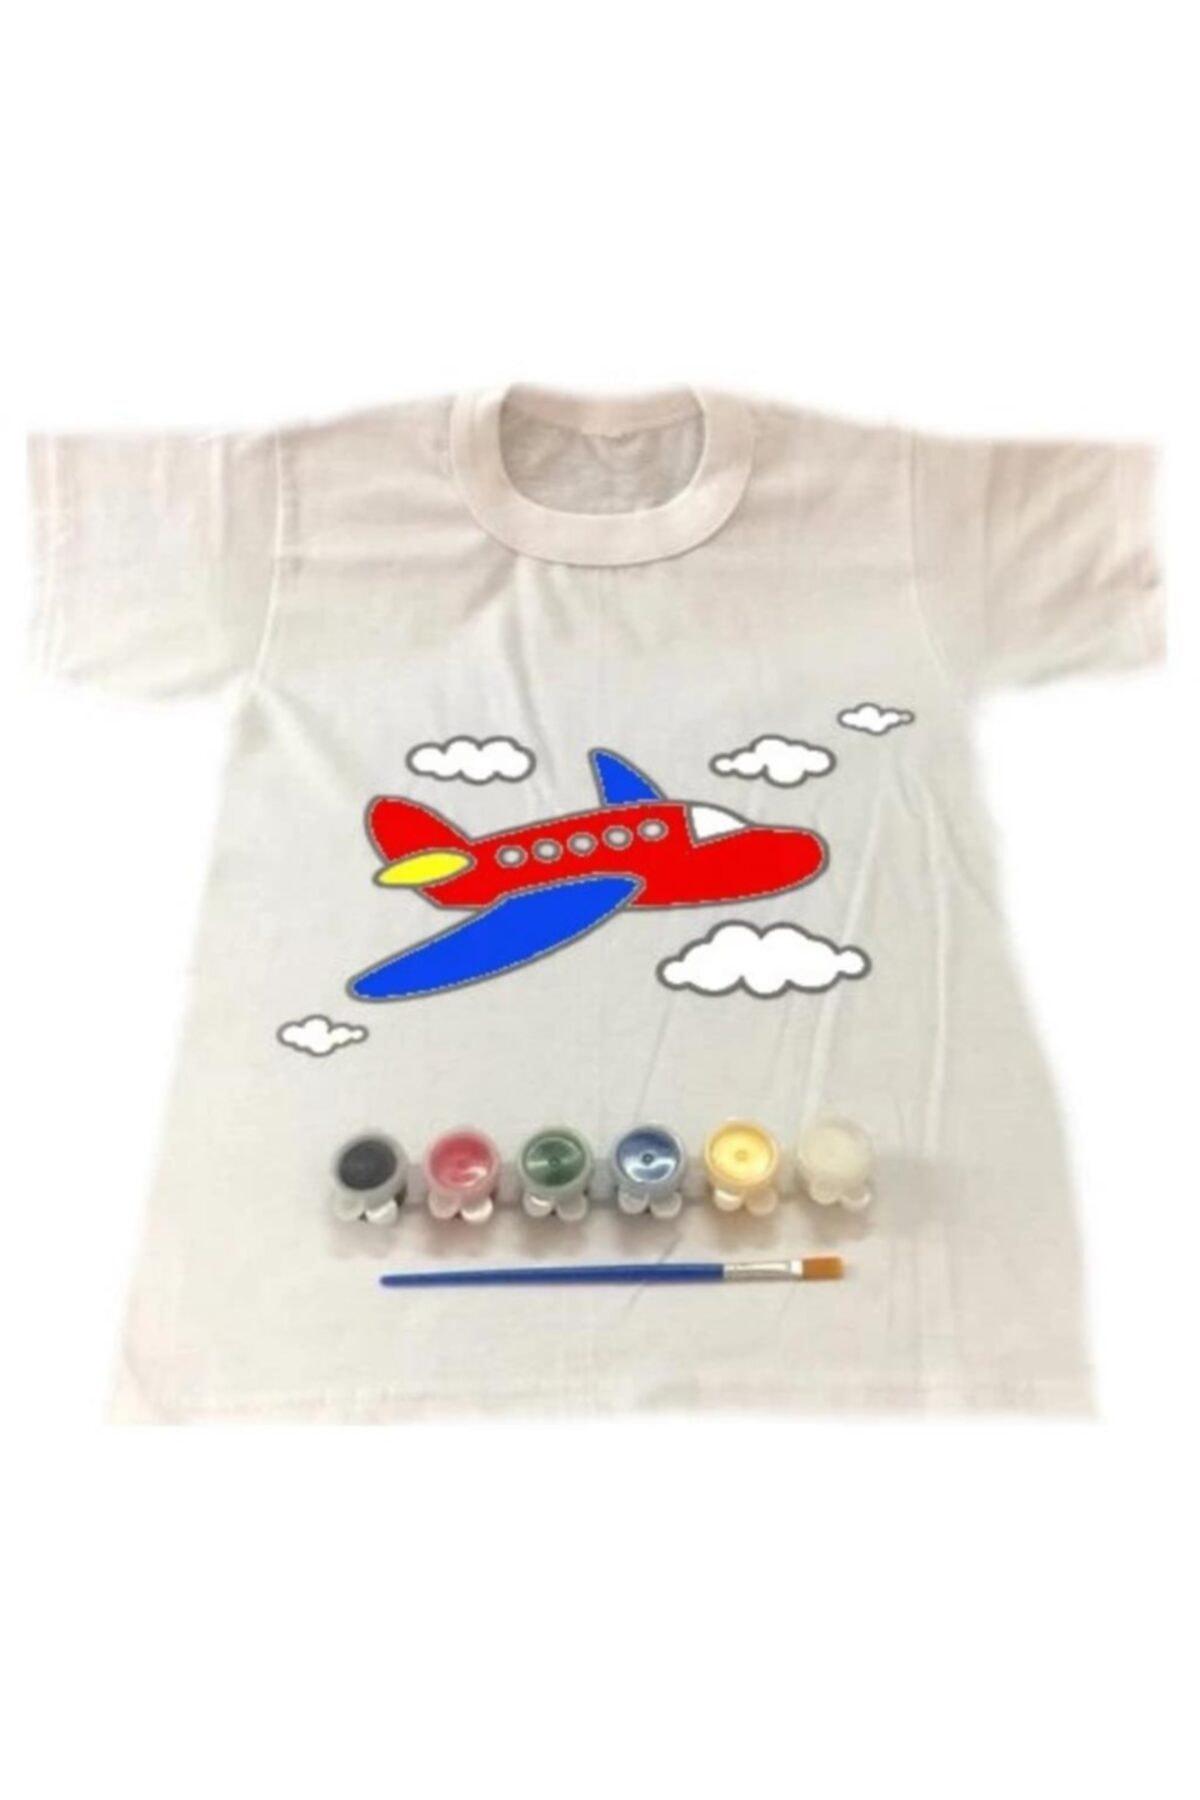 Joy and Toys Uçak Desenli T-shirt Boyama Seti 8-9 Yaş Çocuk Aktivite 2